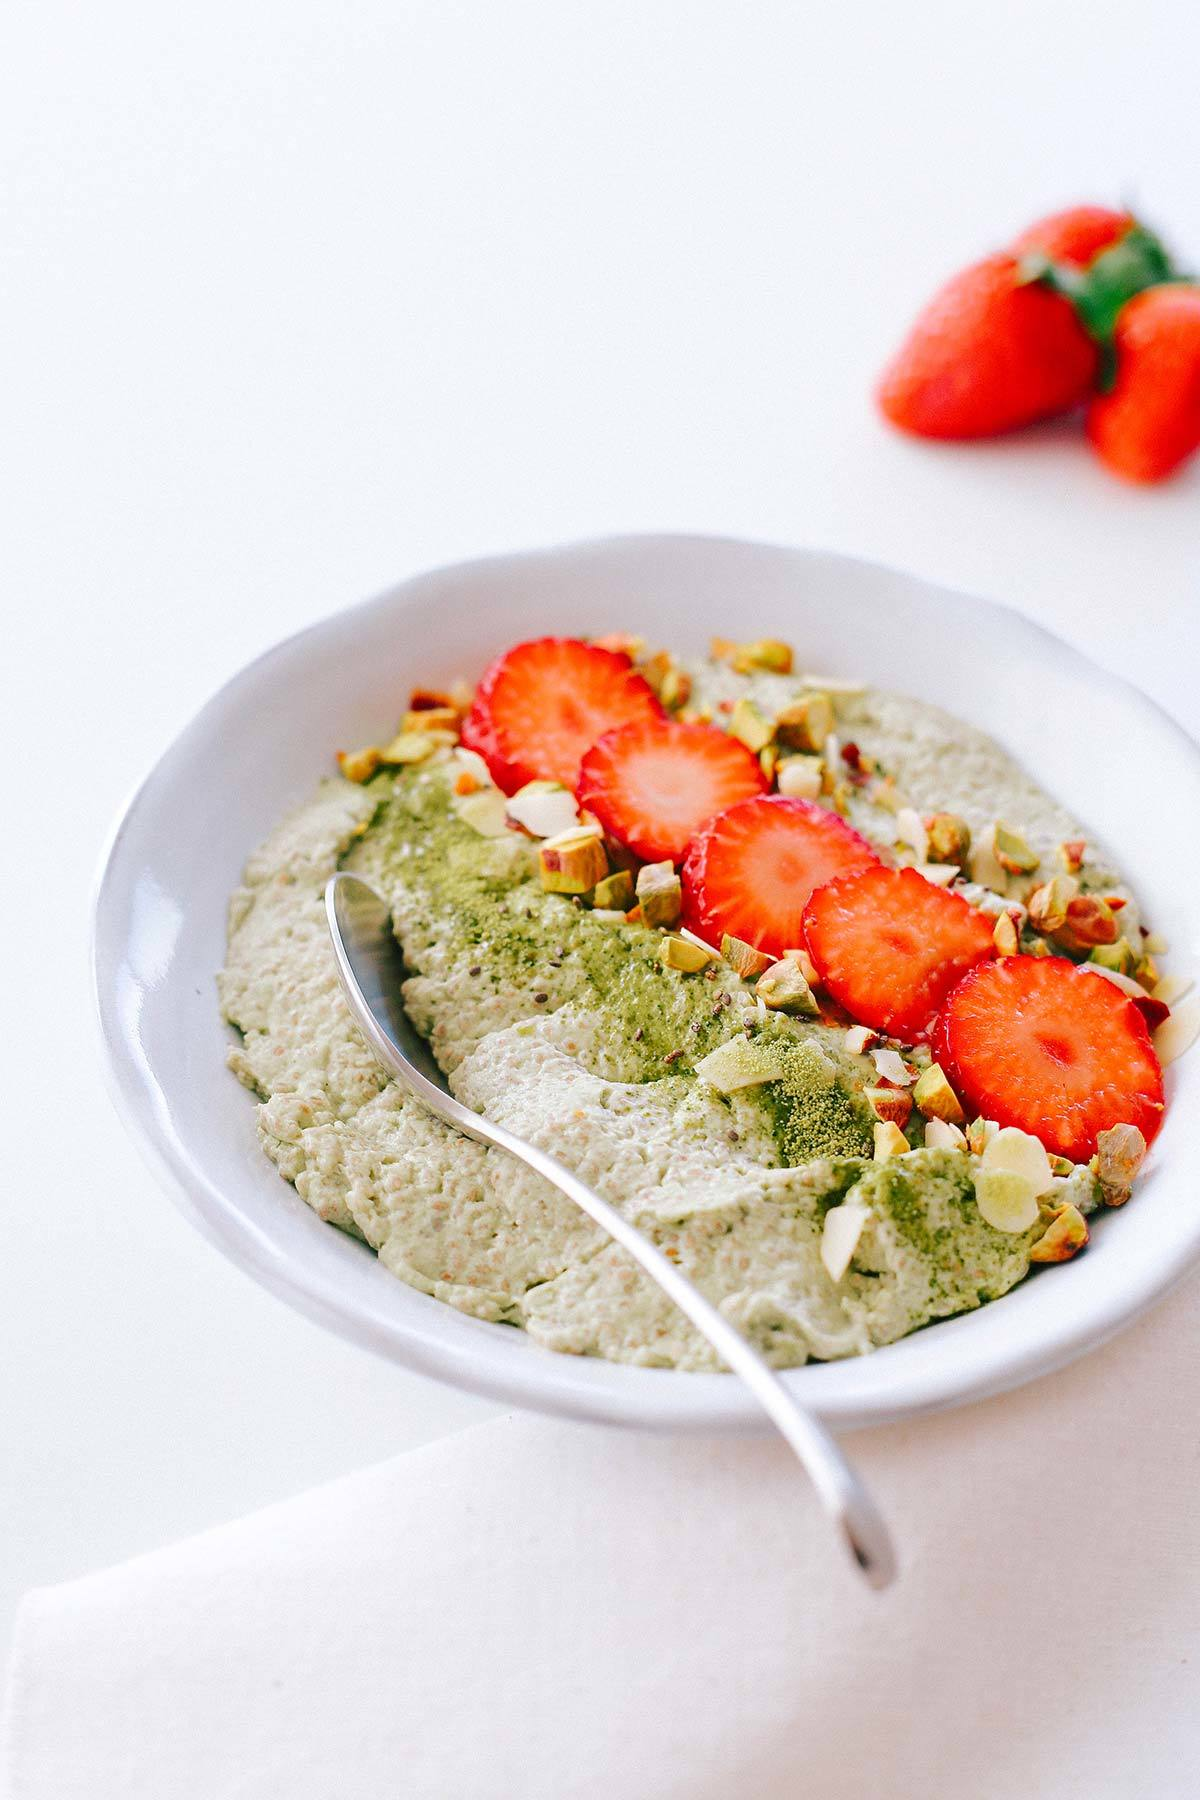 Essen ohne Kohlenhydrate - Dessert - Matcha Chia Pudding mit Kokosmilch